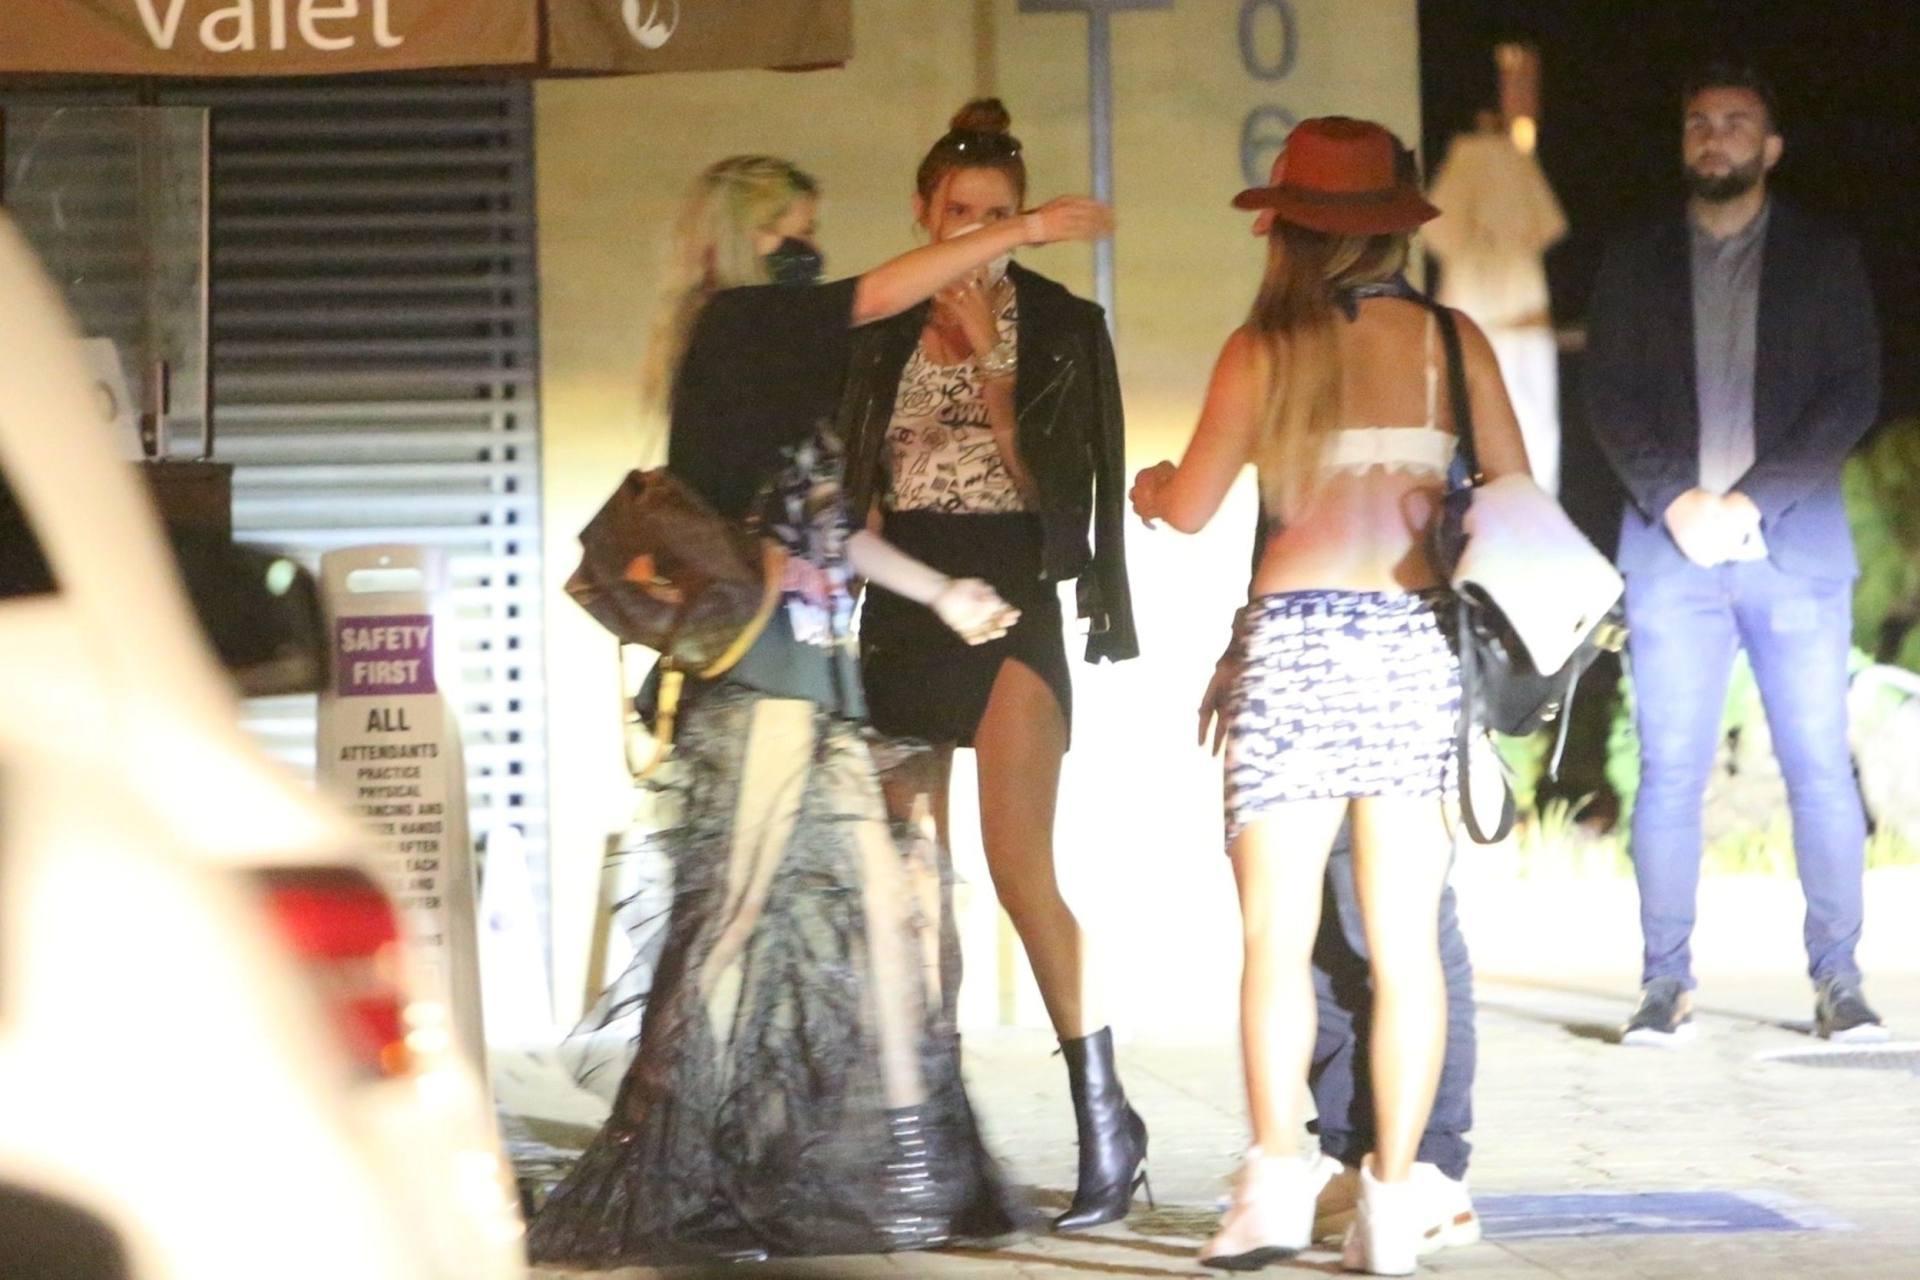 Bella & Dani Thorne – Sexy Legs In Mini Skirts At Nobu In Malibu 0021